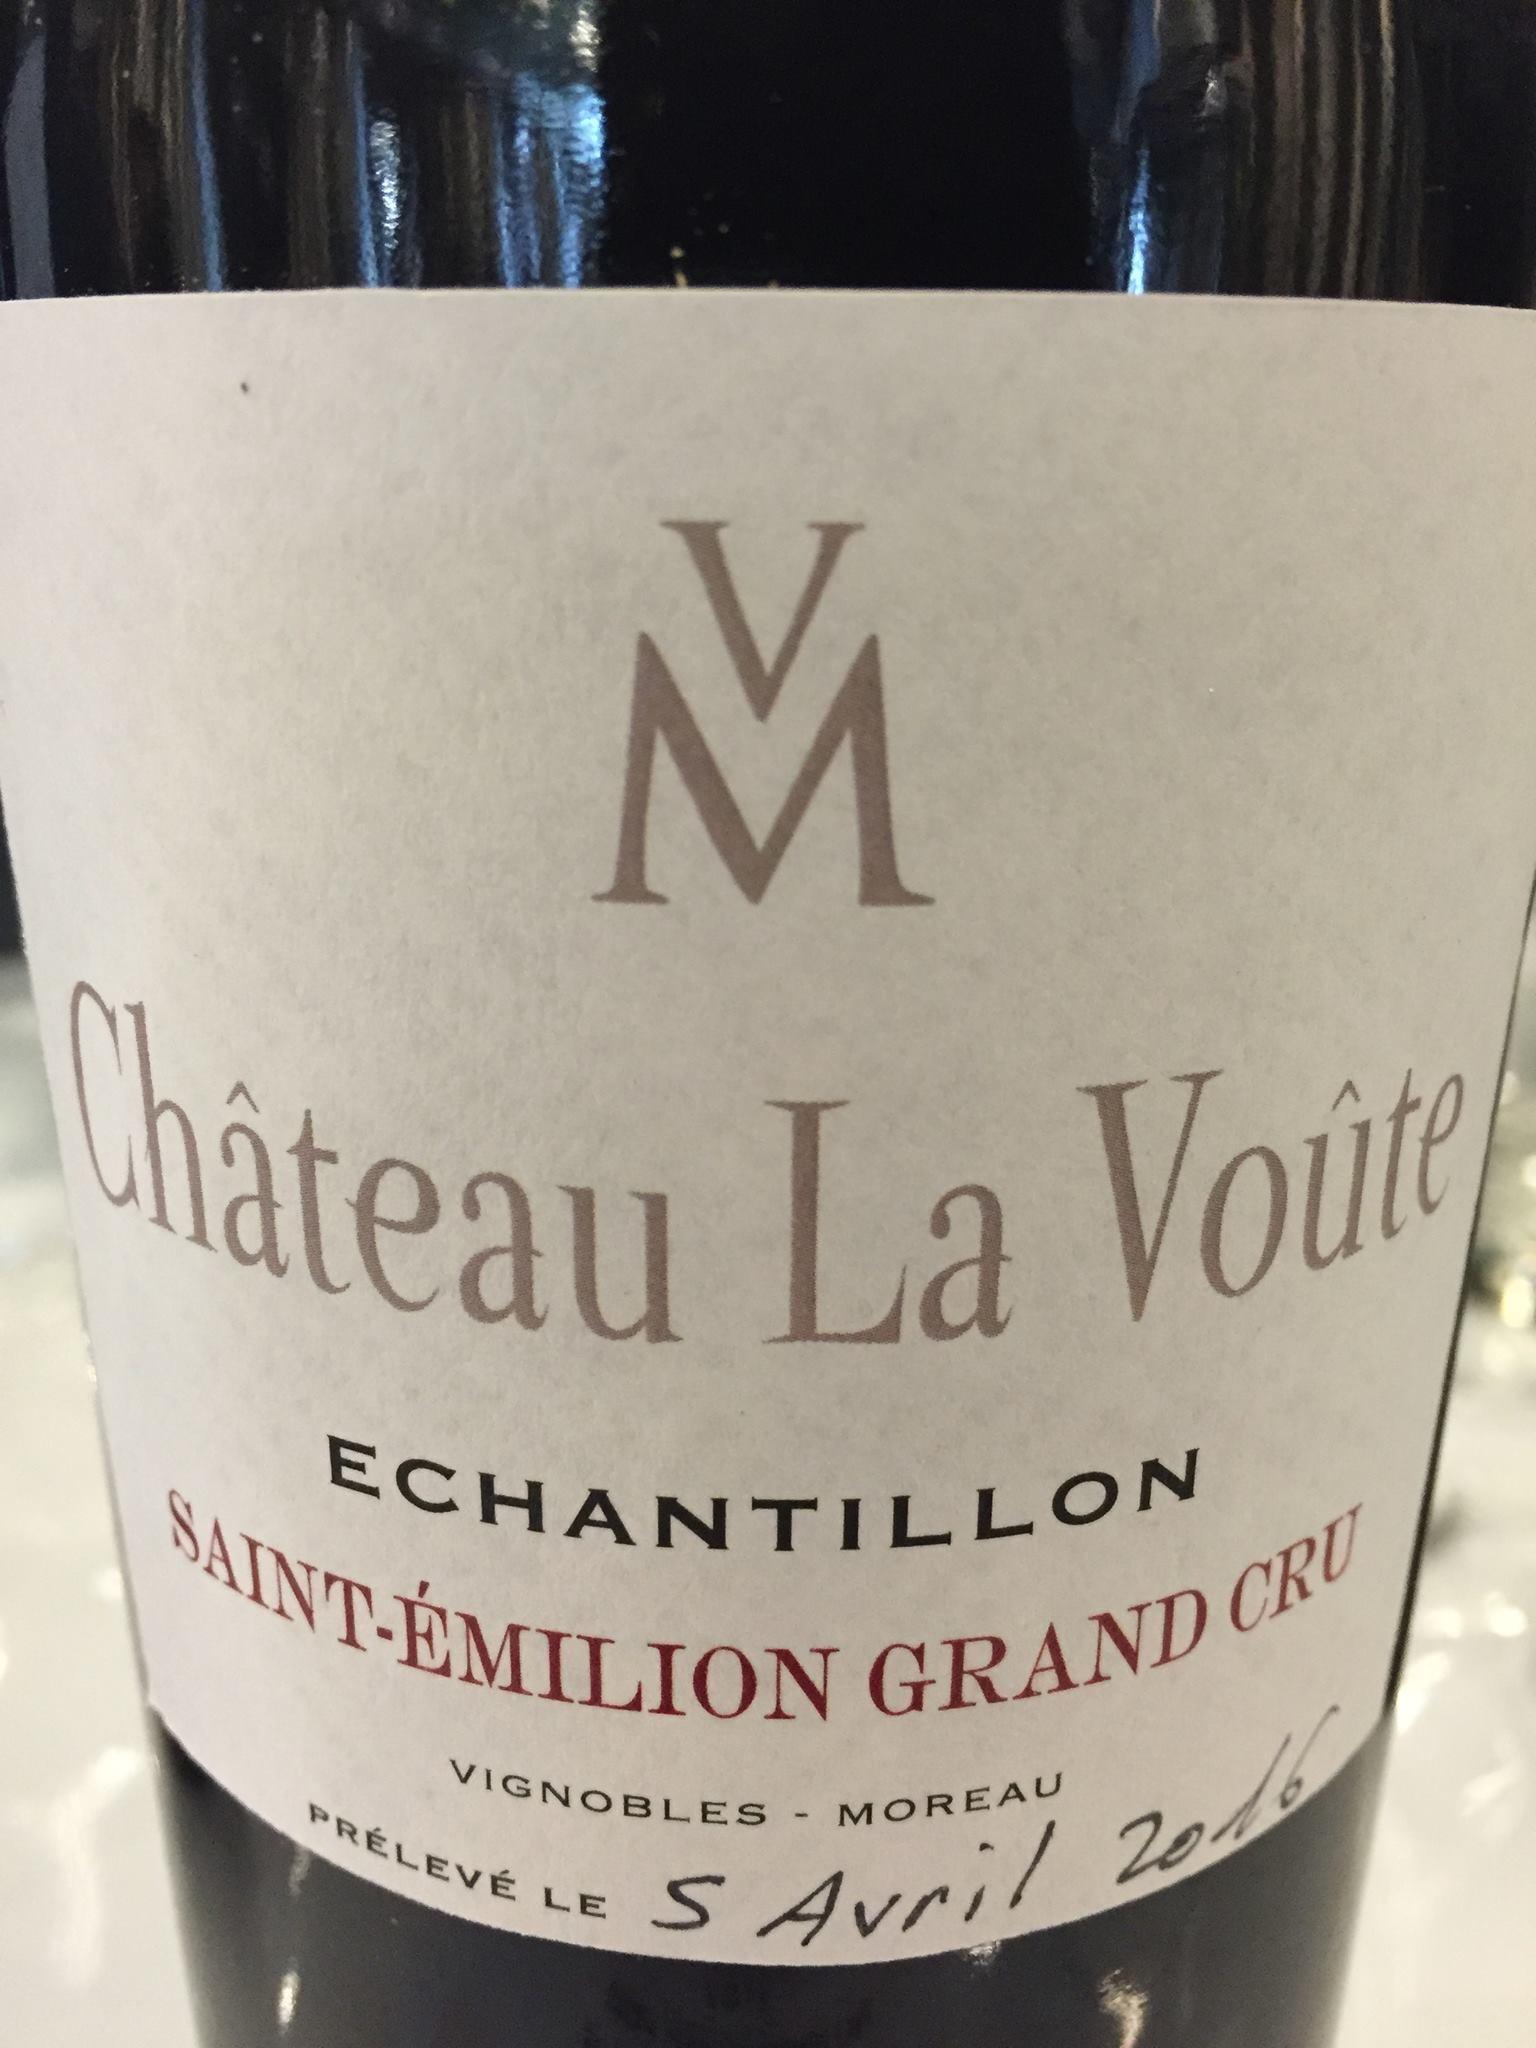 Château La Voûte 2015 – Saint-Emilion Grand Cru